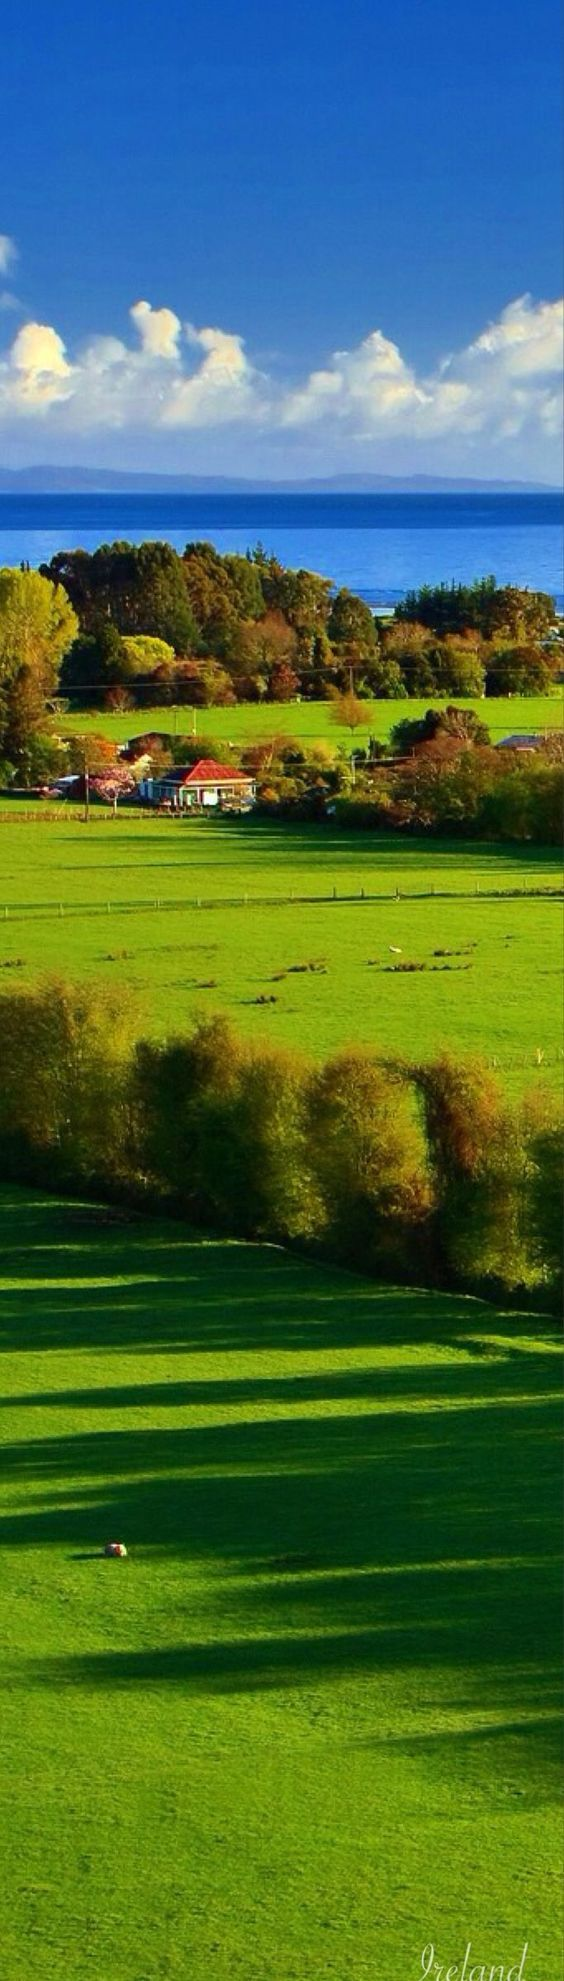 Lush landscape in Ireland.